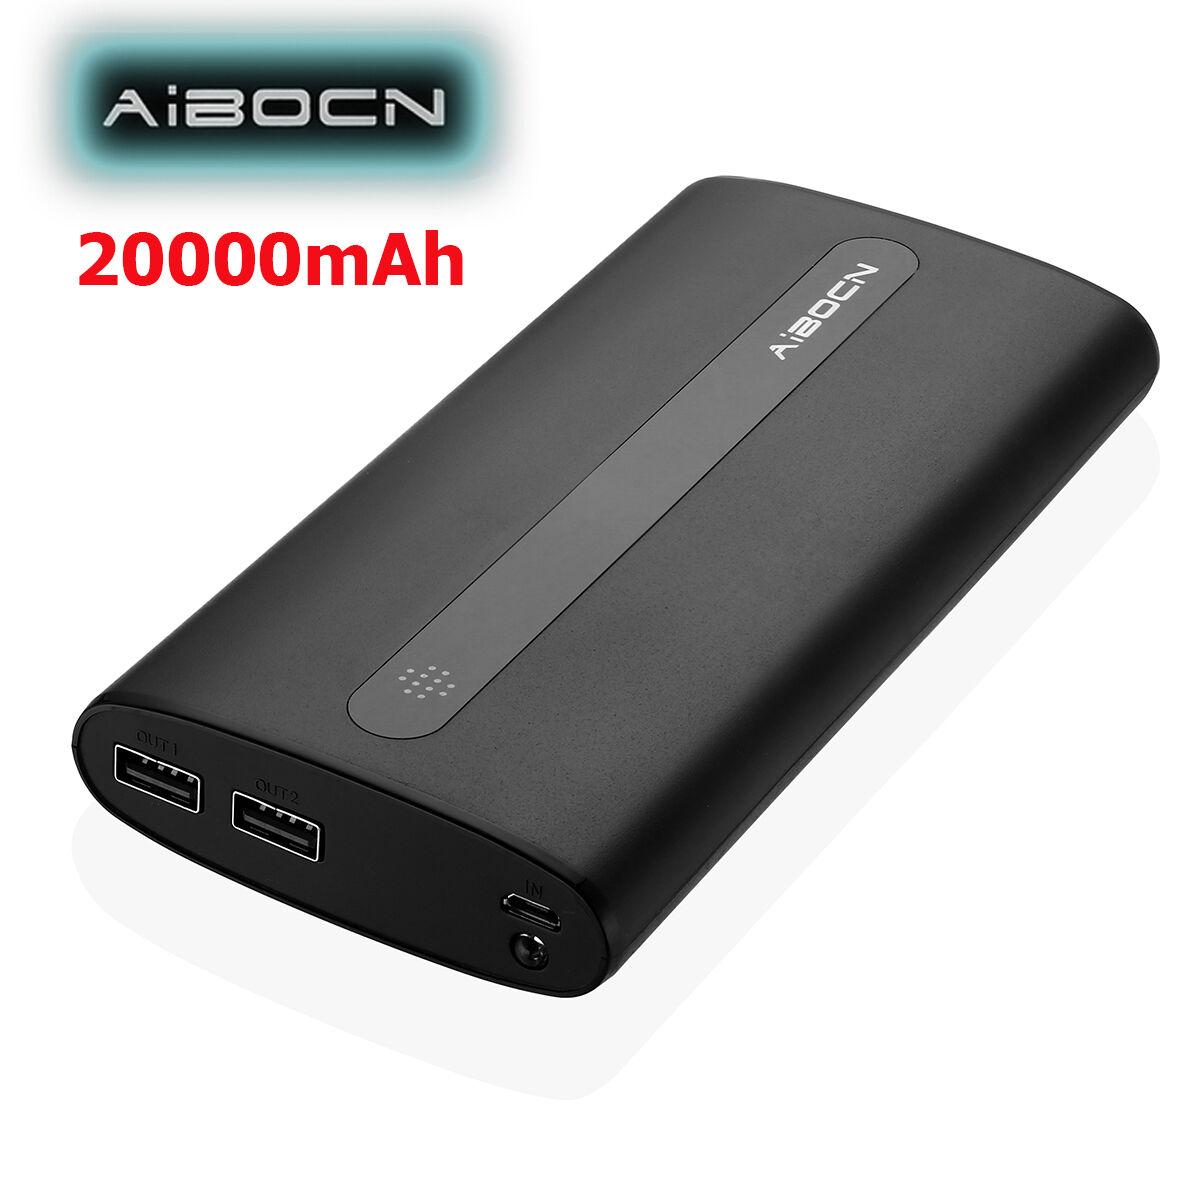 Aibocn 20000mAh Dual USB Power Bank Portable Cell Phone Char